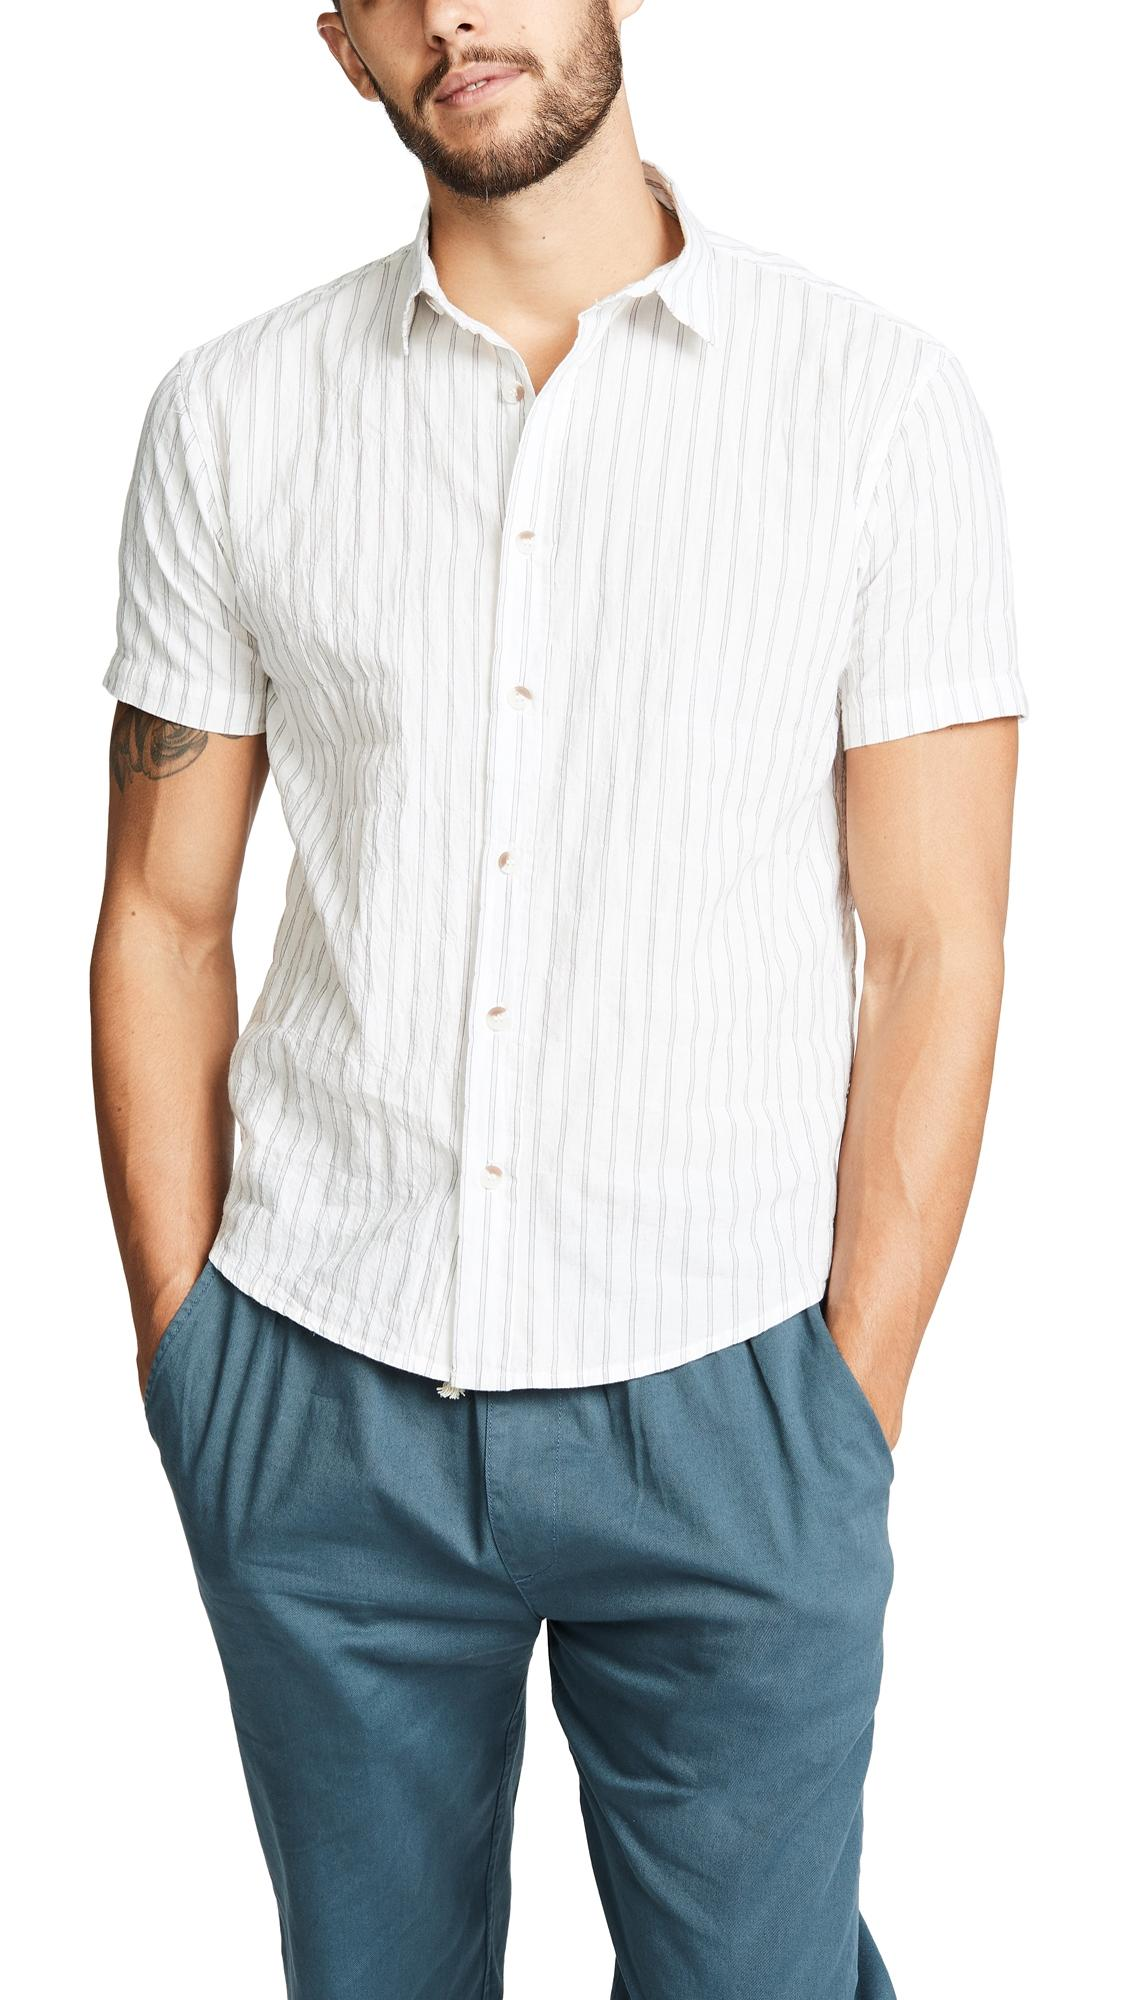 76e7d8aed86f Mollusk Summer Shirt In White Stripe